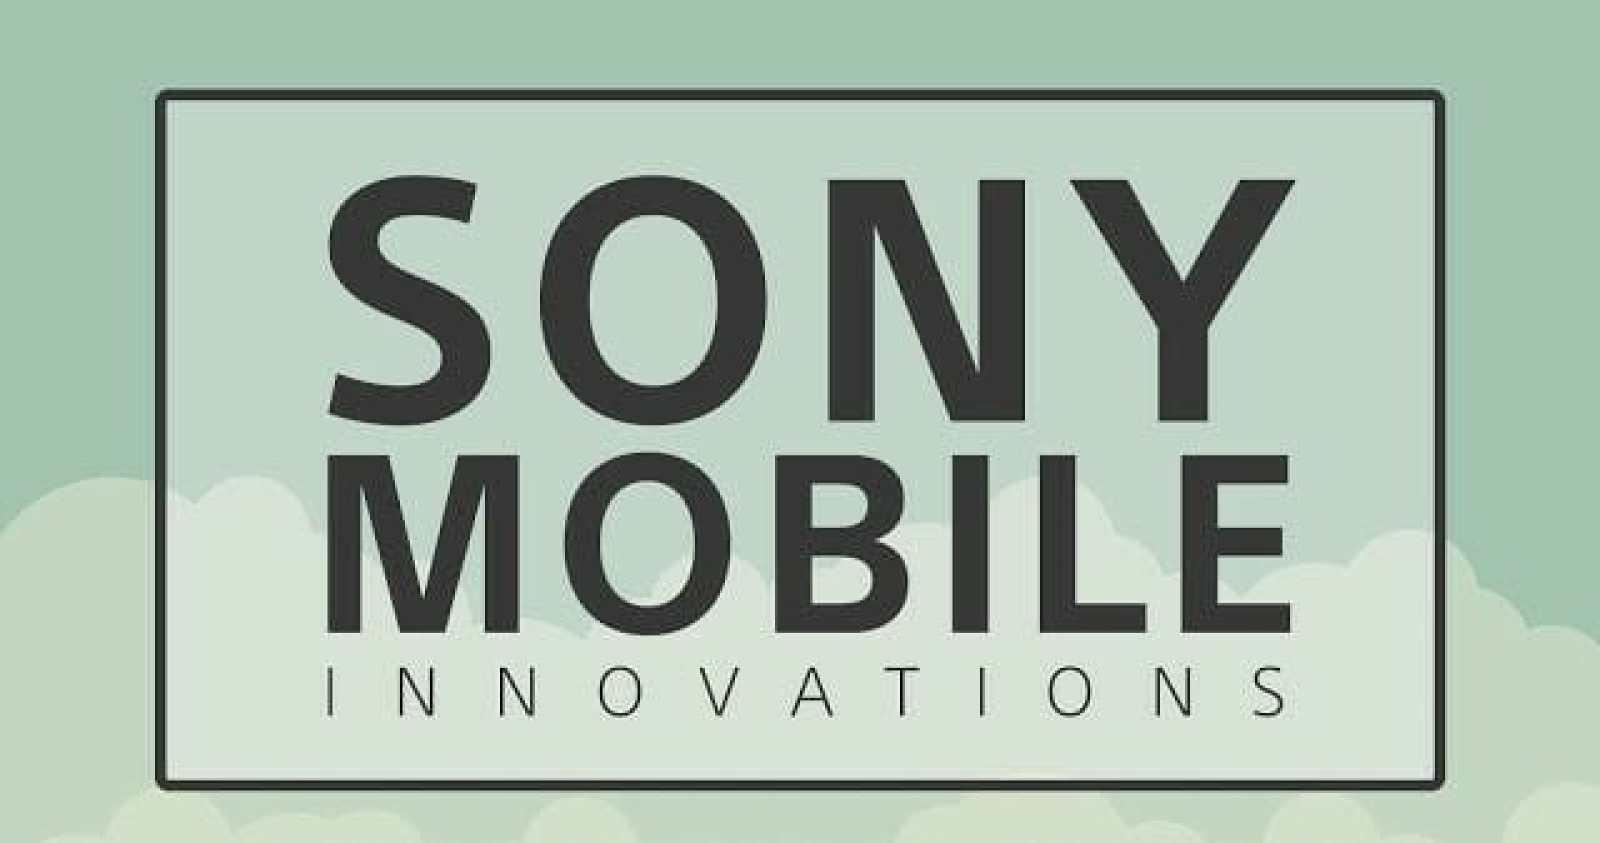 - Mobile Innovation Infographic v4 page 001 fd28c386d7afa3f62500e2a439a35ed3 2 - รวมที่สุดของเทคโนโลยีใน Sony Xperia มีอะไรบ้างมาดูกัน